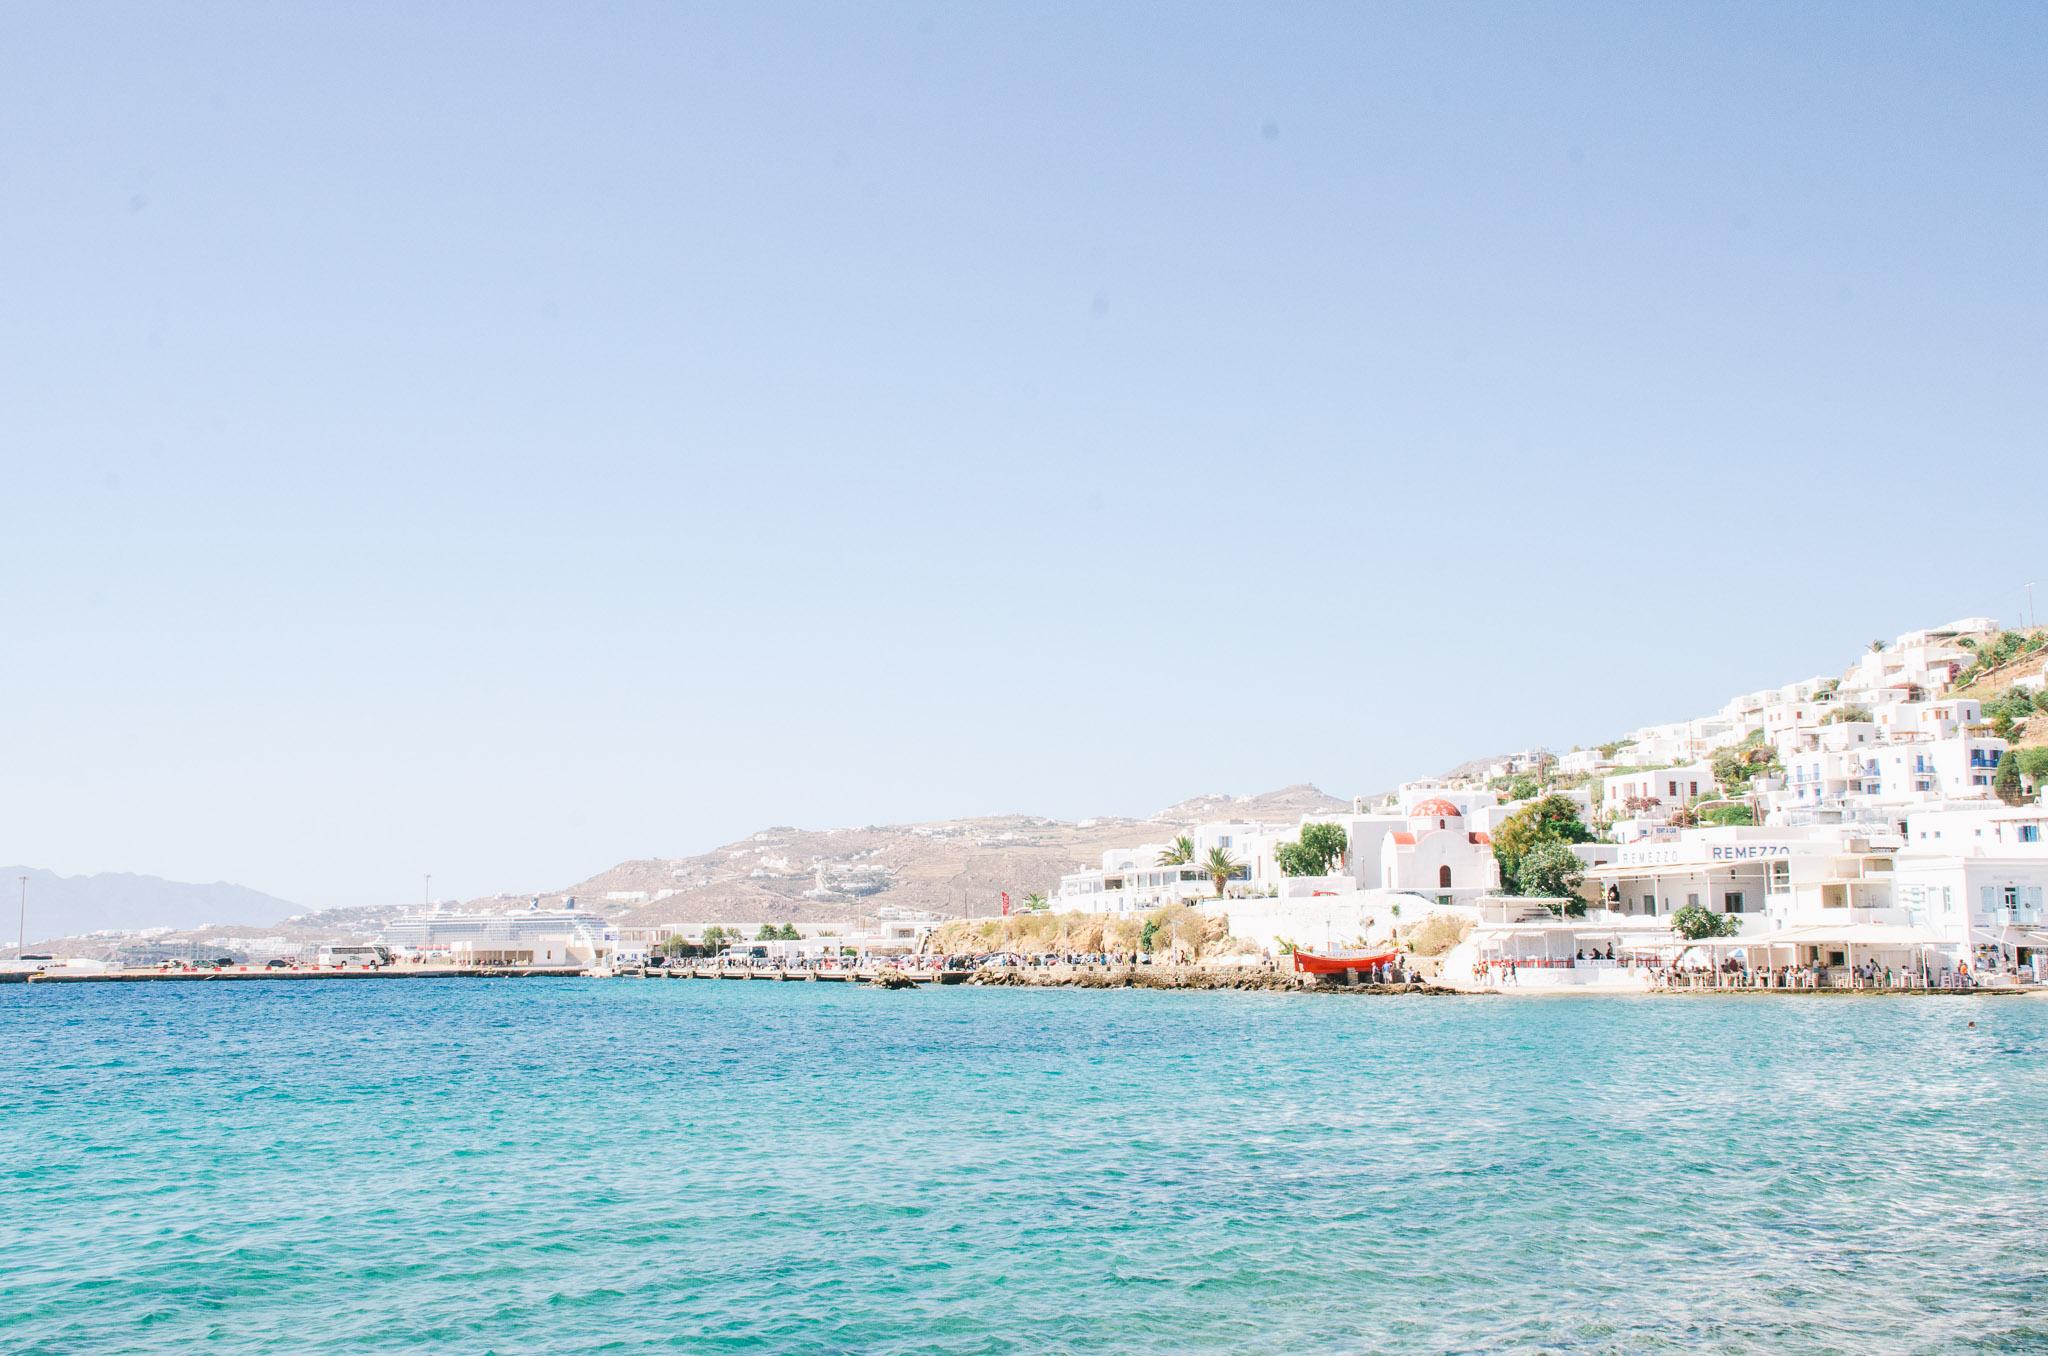 greece-mykonos-10.jpg